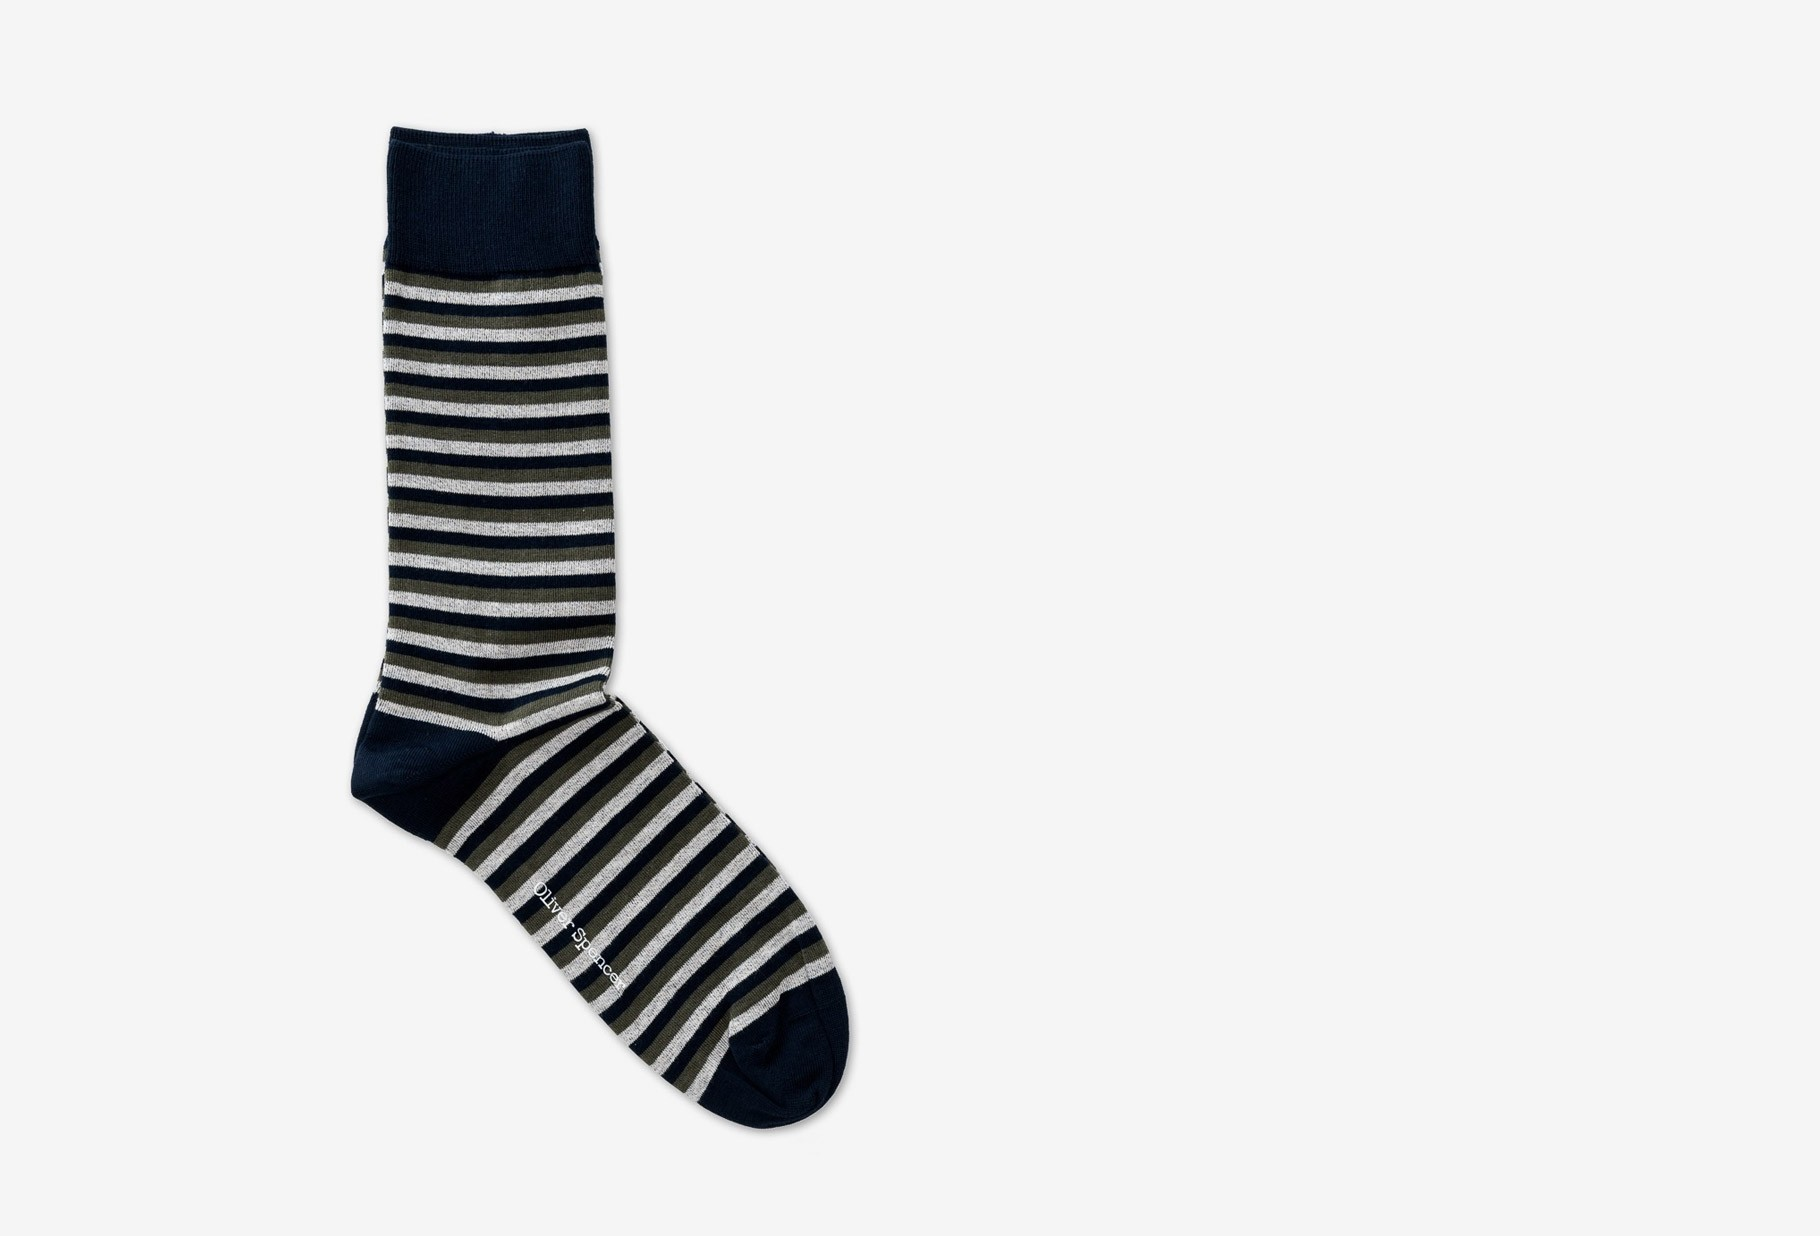 OLIVER SPENCER / Miller socks briggs Green multi